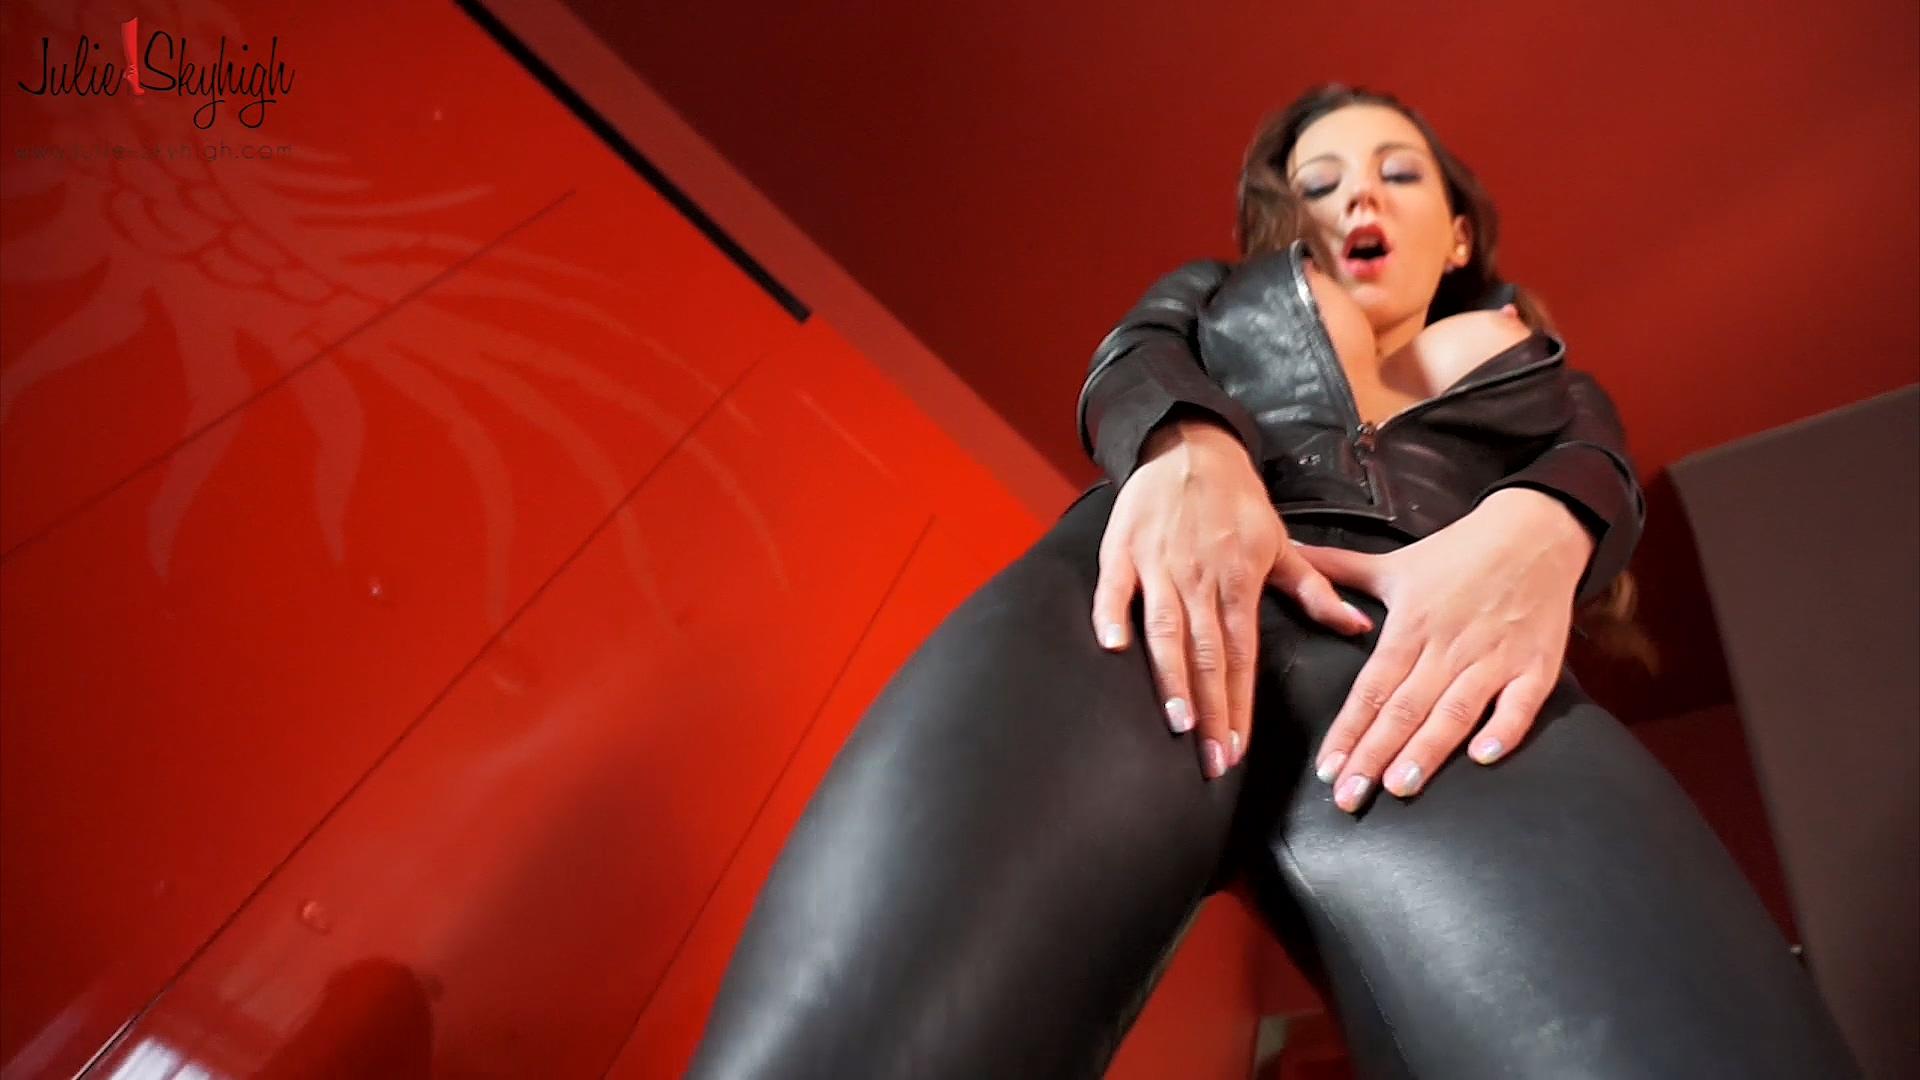 391578171_masturbation_leather_catsuit_part_2.mp4_20191226_221427.395_123_446lo.jpg